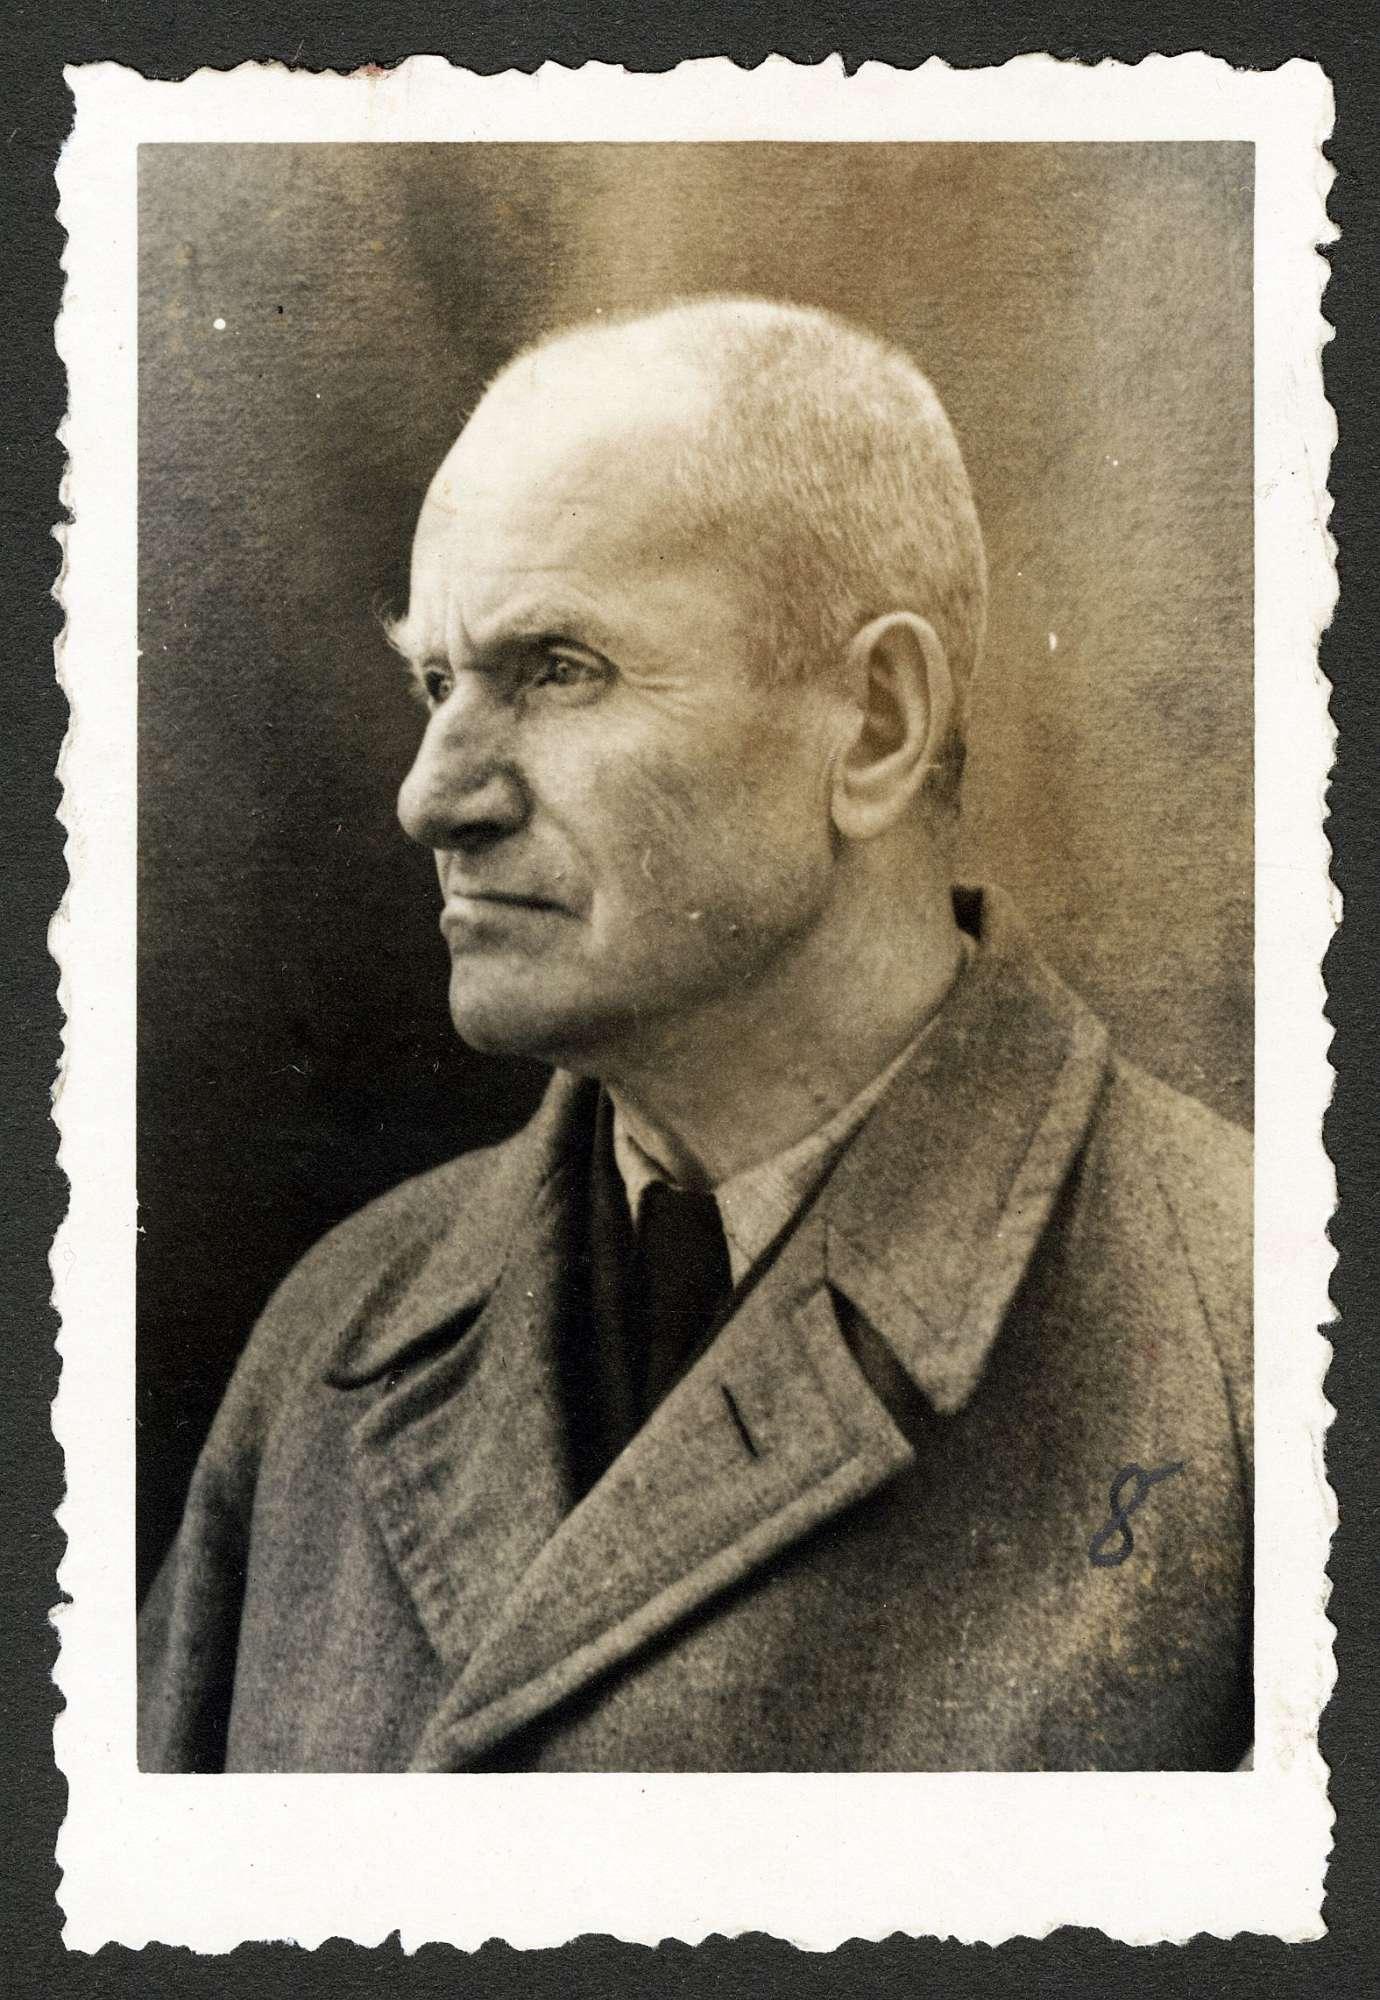 Spellenberg, Gottlieb, Bild 1